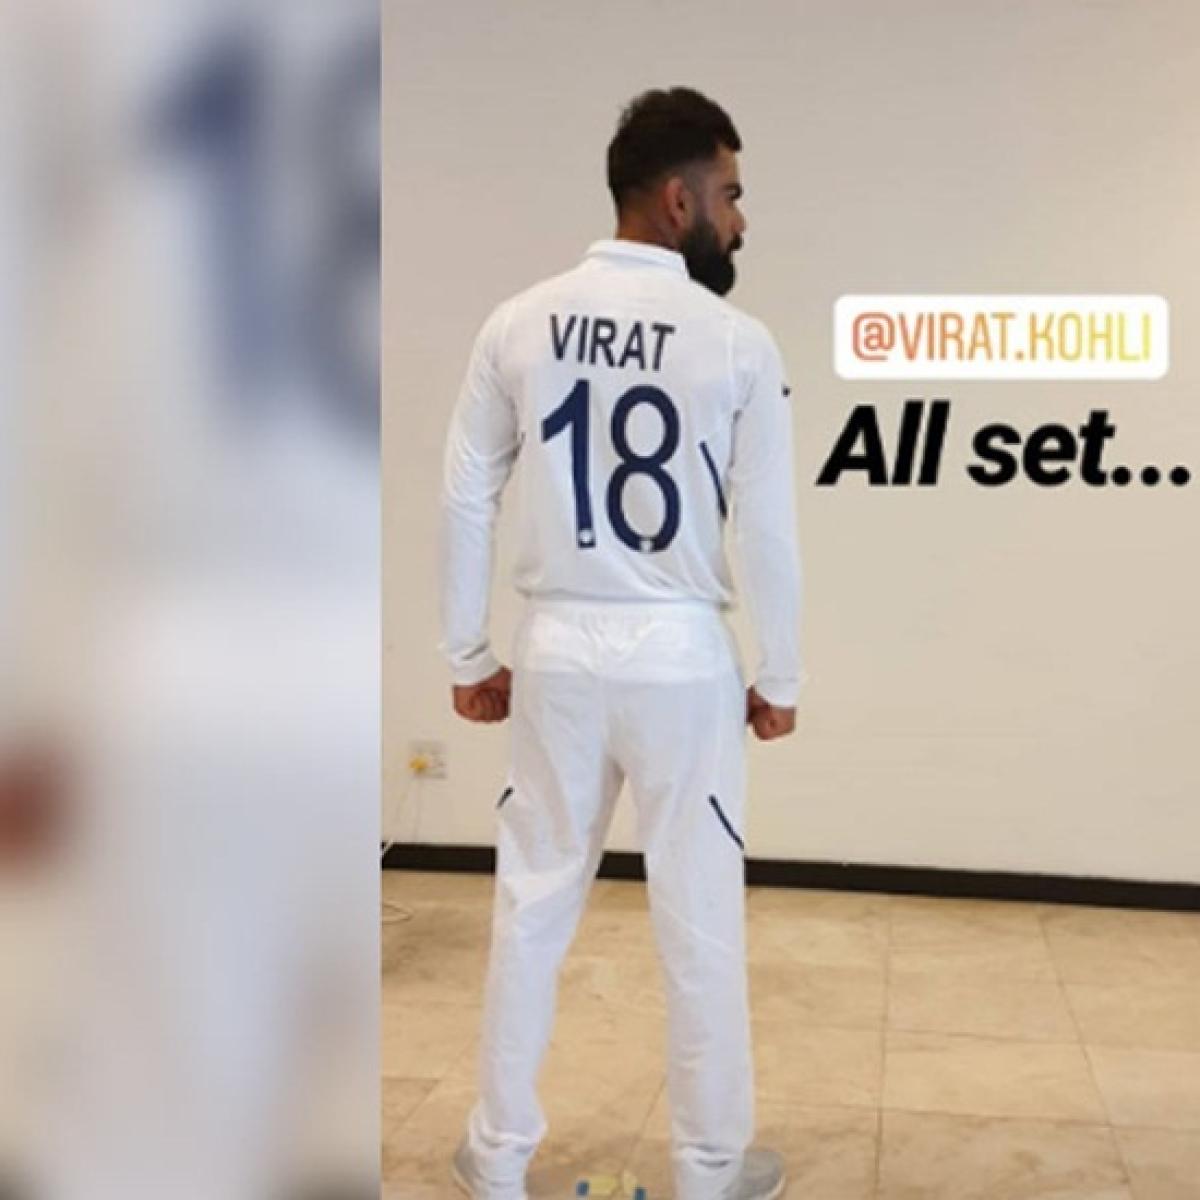 Virat Kohli, Rohit Sharma reveal jersey numbers on new Test kit ahead of World Test Championship; see pics